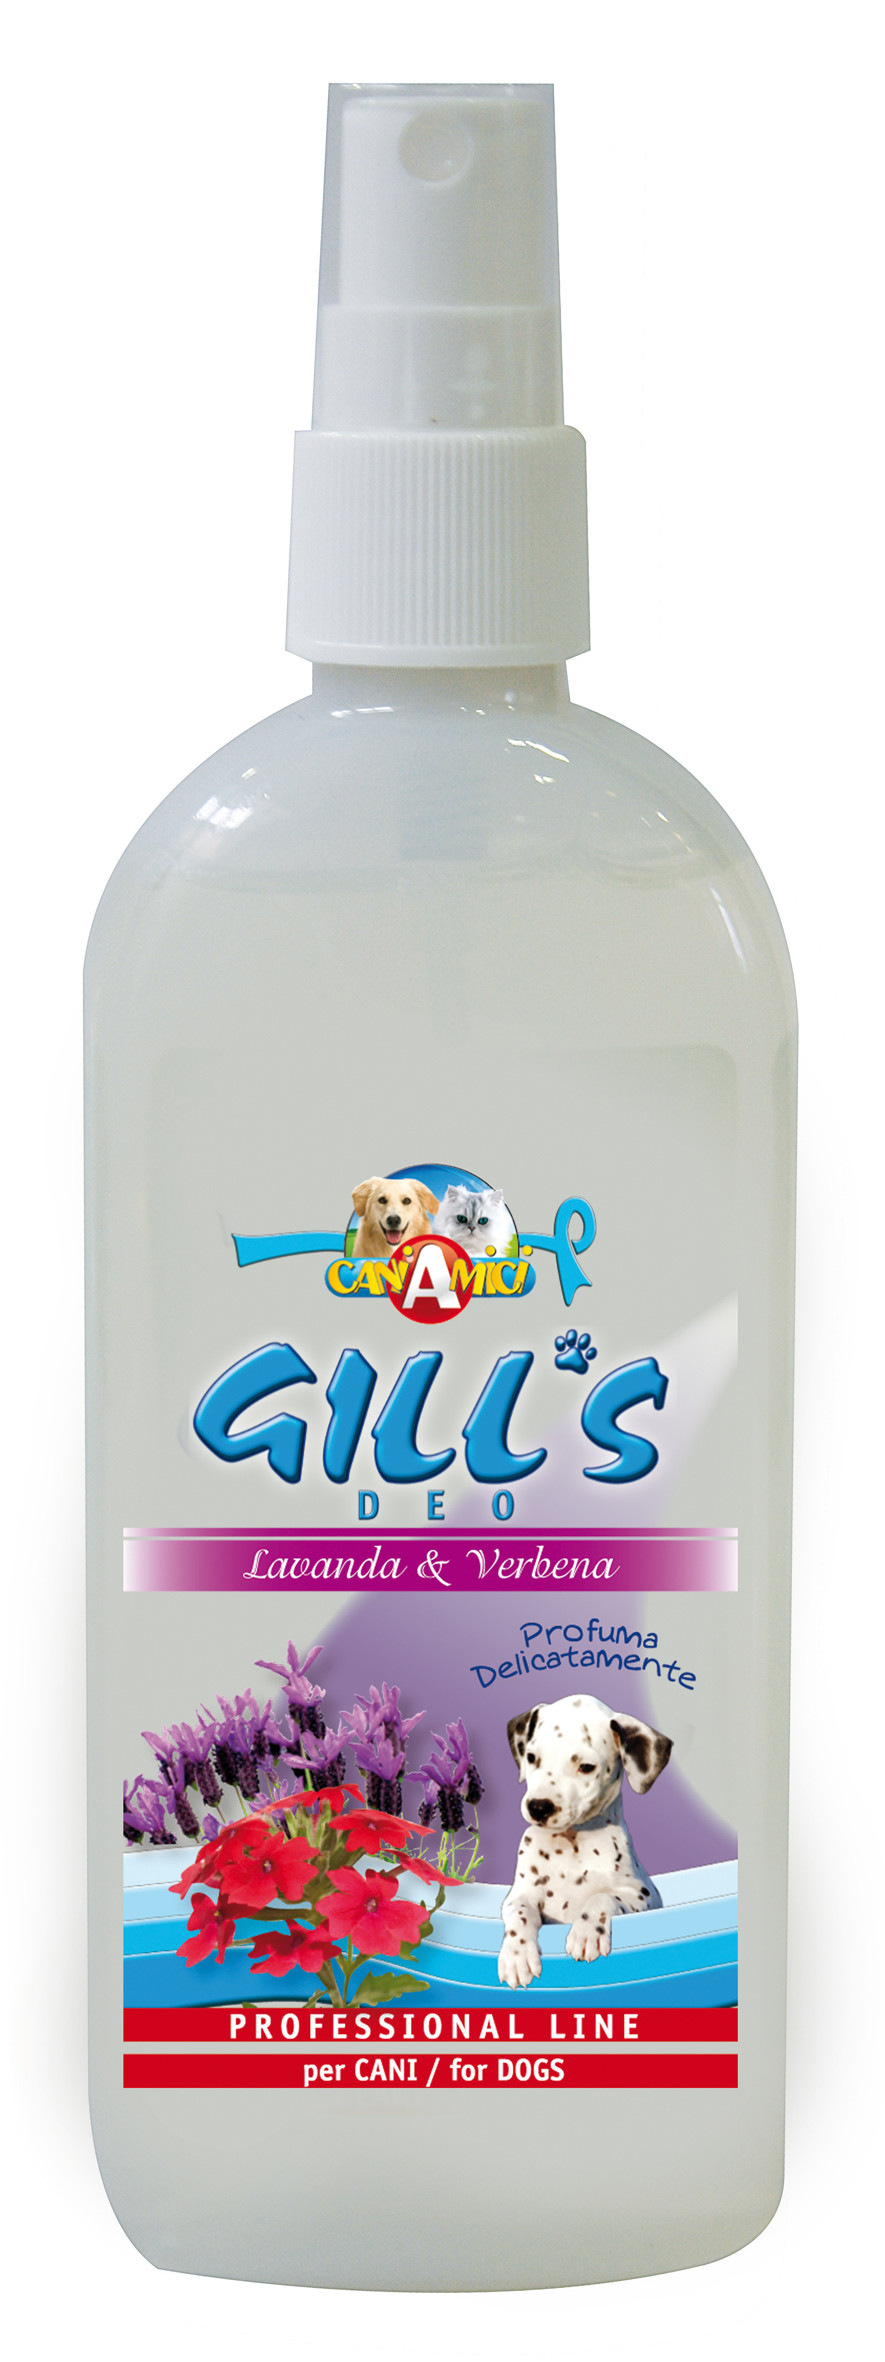 Image of Gill's Deodorante 150 ml Lavanda e Verbena 9018380